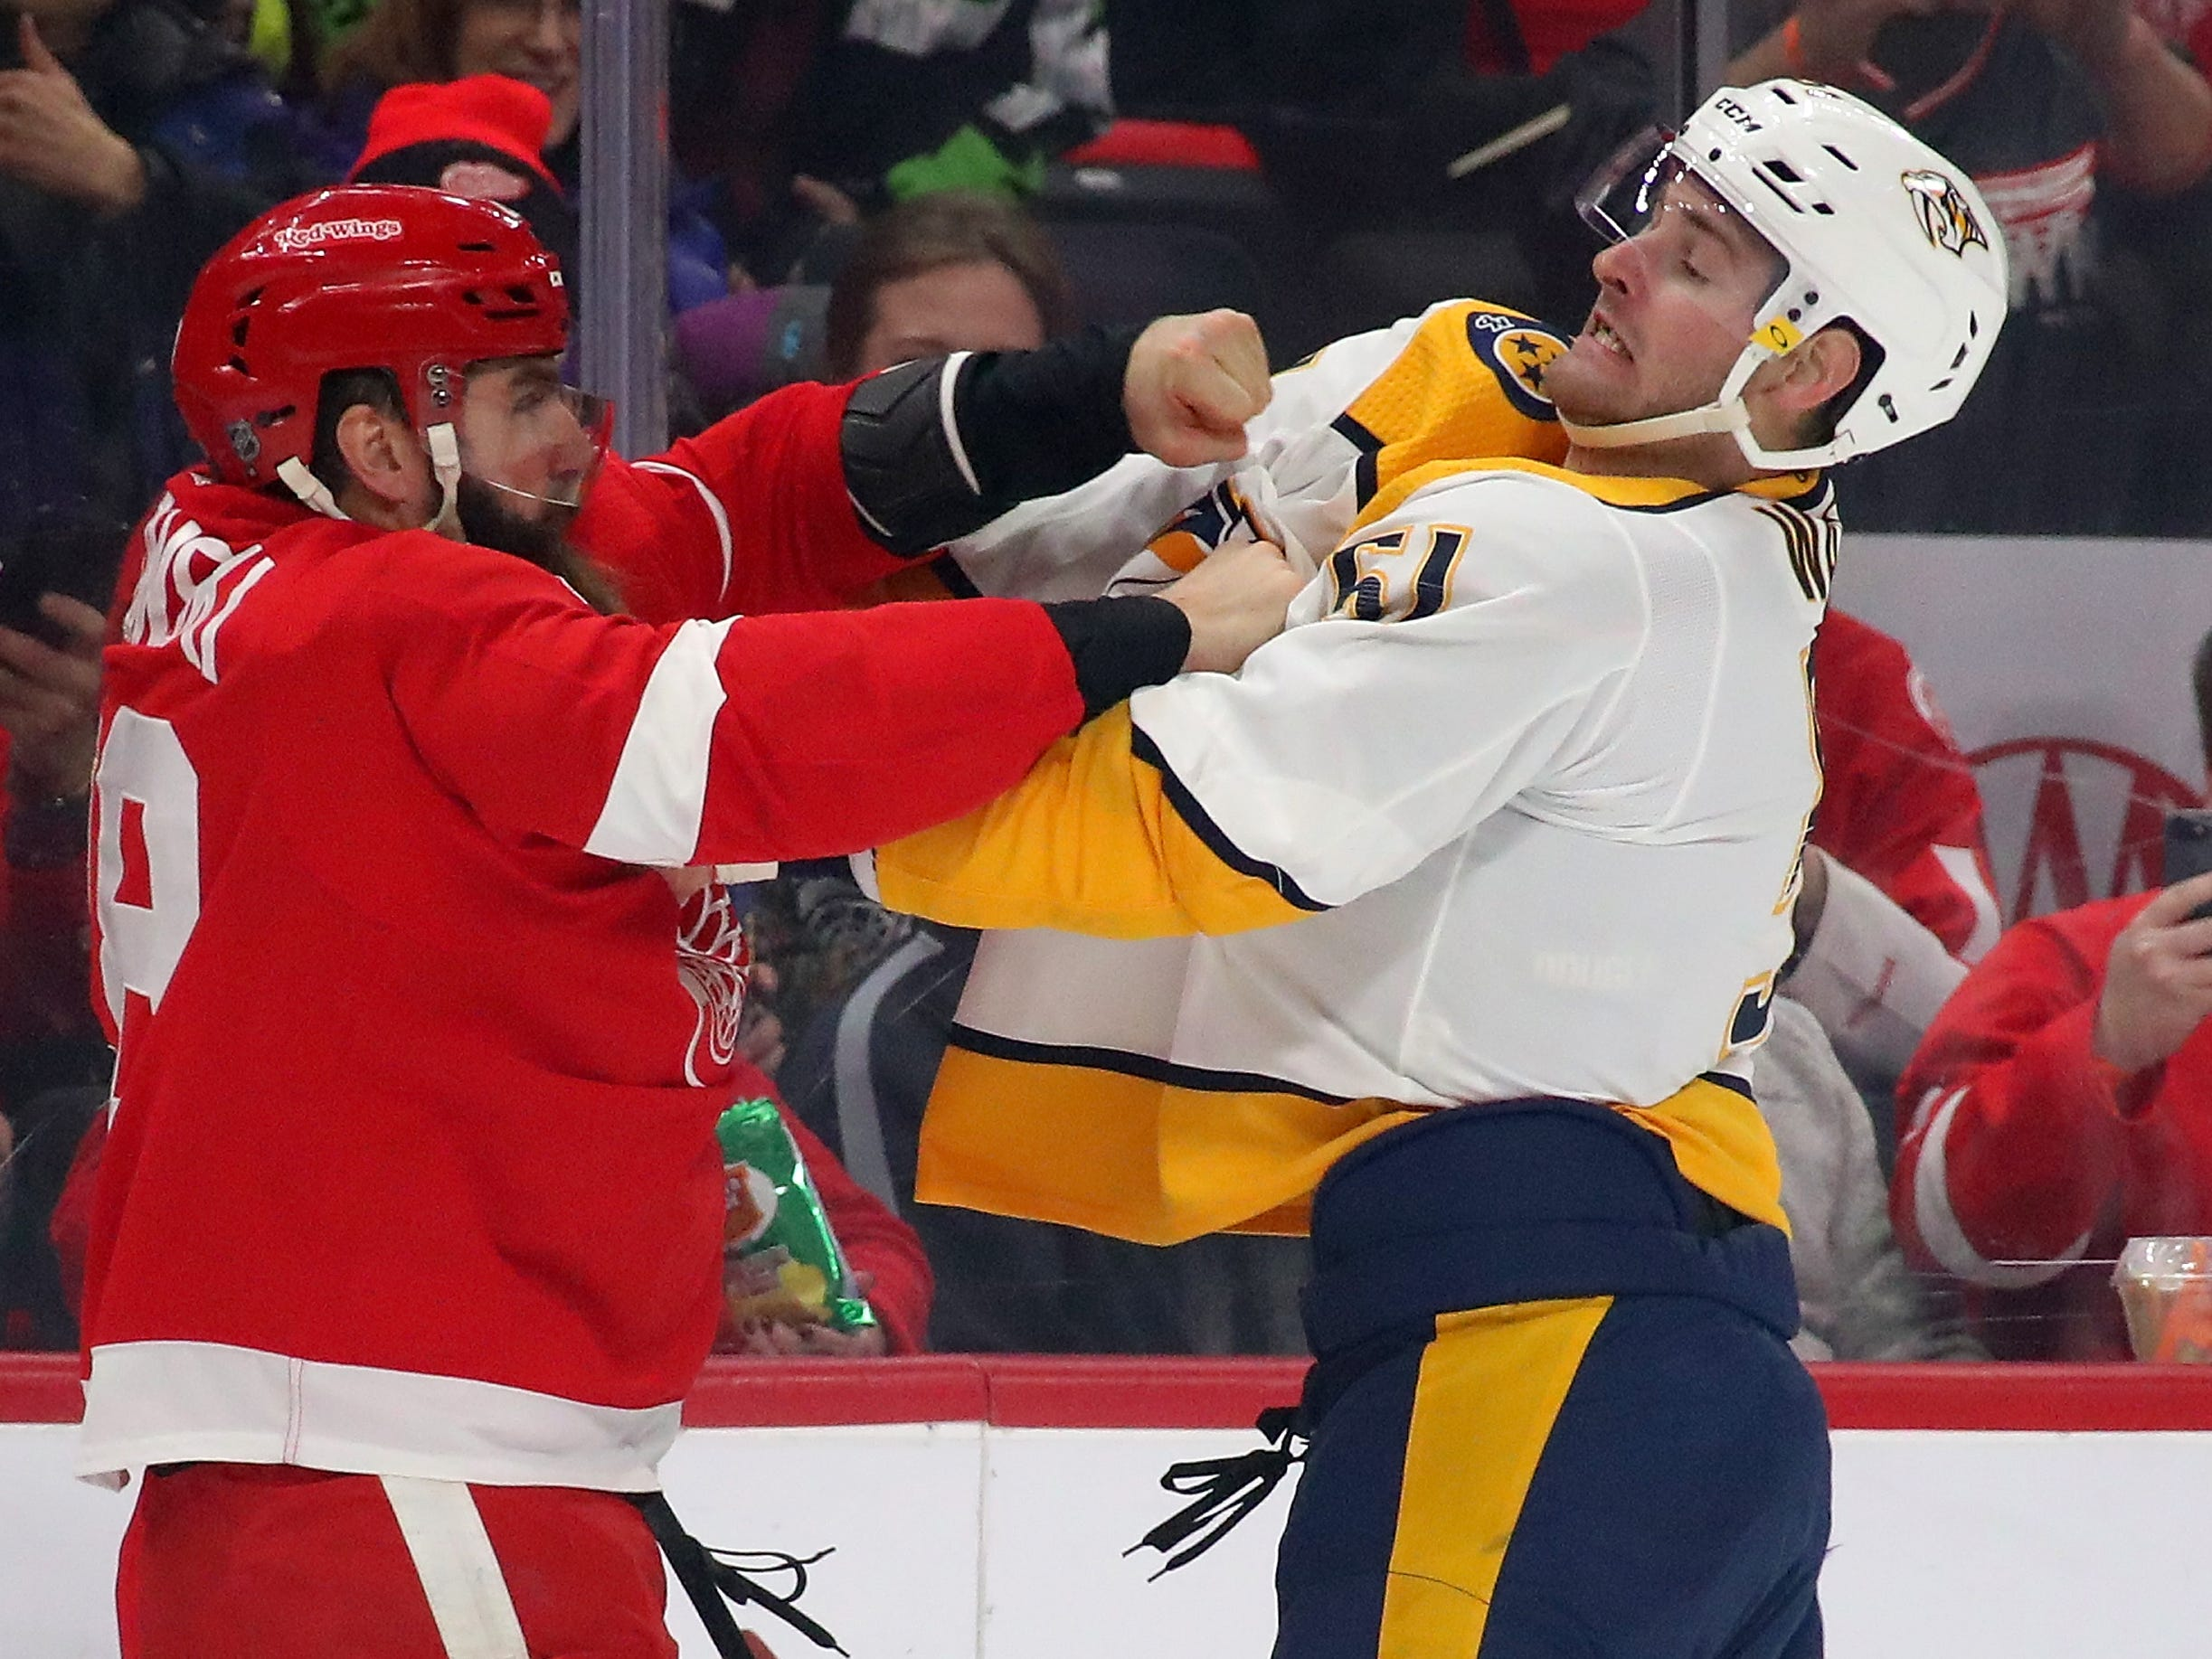 Predators' Austin Watson (51) fights Red Wings' Luke Witkowski (28) in the first period at Little Caesars Arena on Jan. 4, 2019 in Detroit, Michigan.